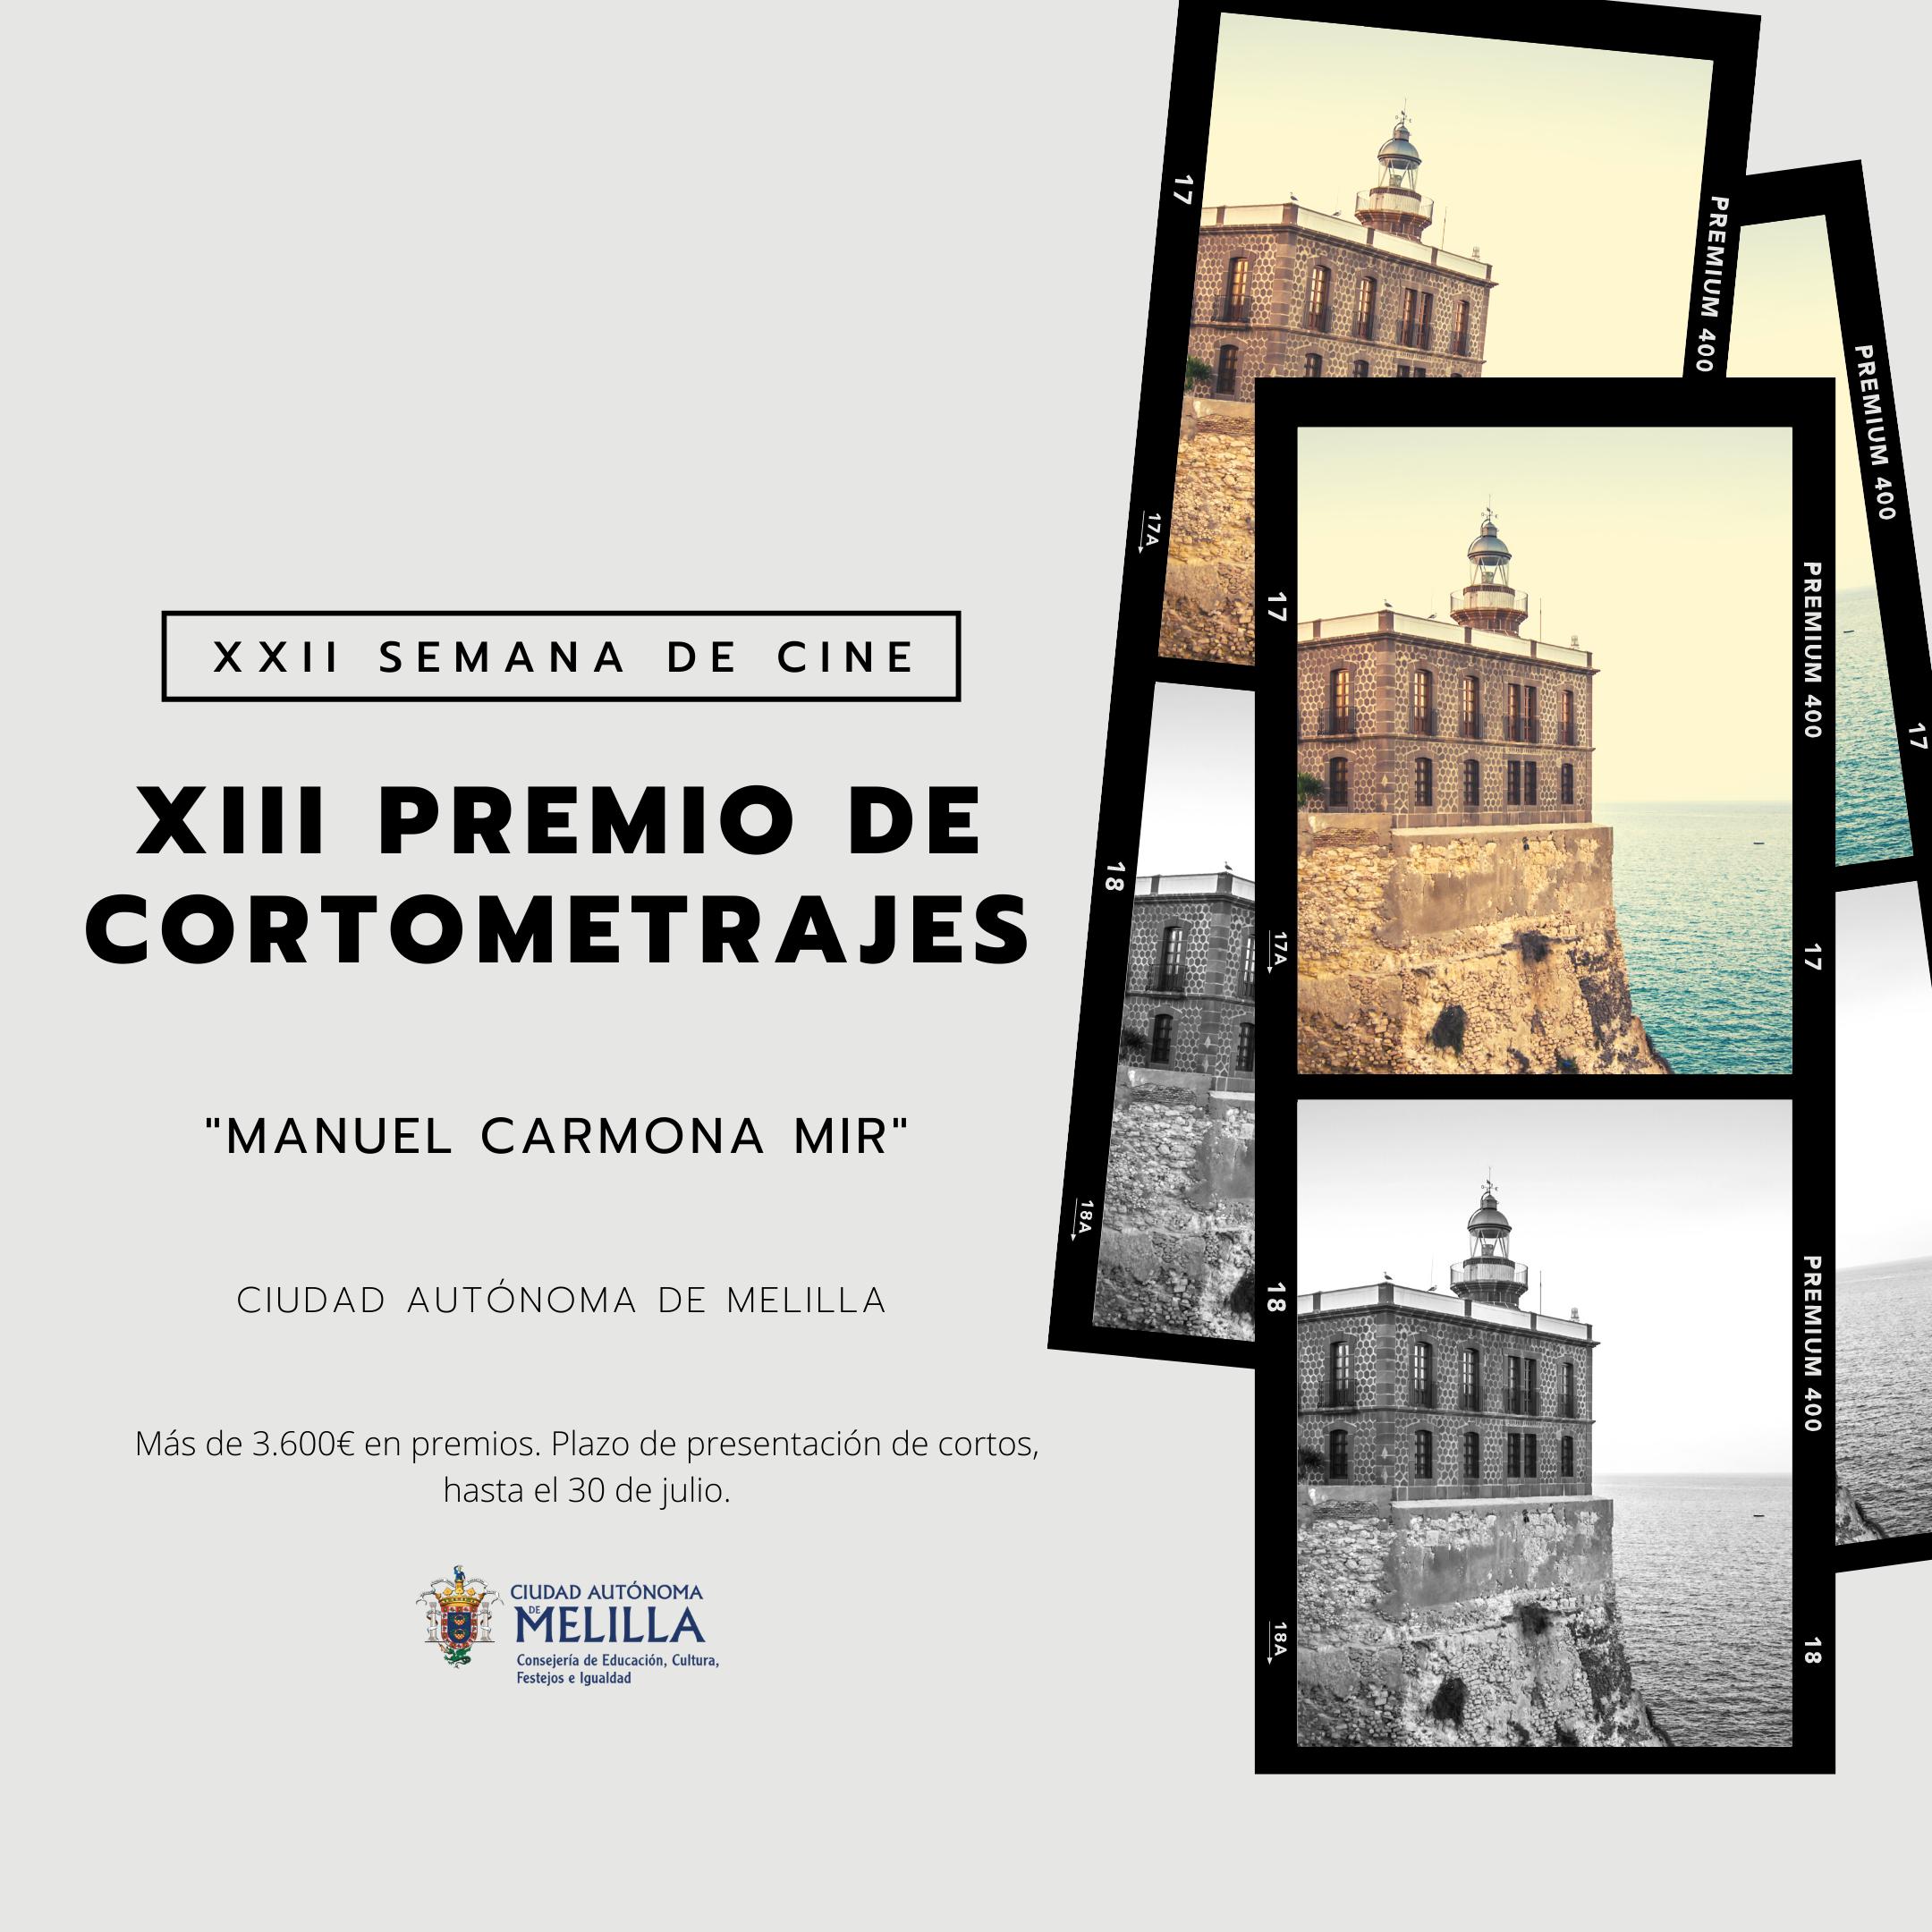 XIII Premio de cortometrajes «Manuel Carmona Mir» de la XII Semana de Cine de Melilla